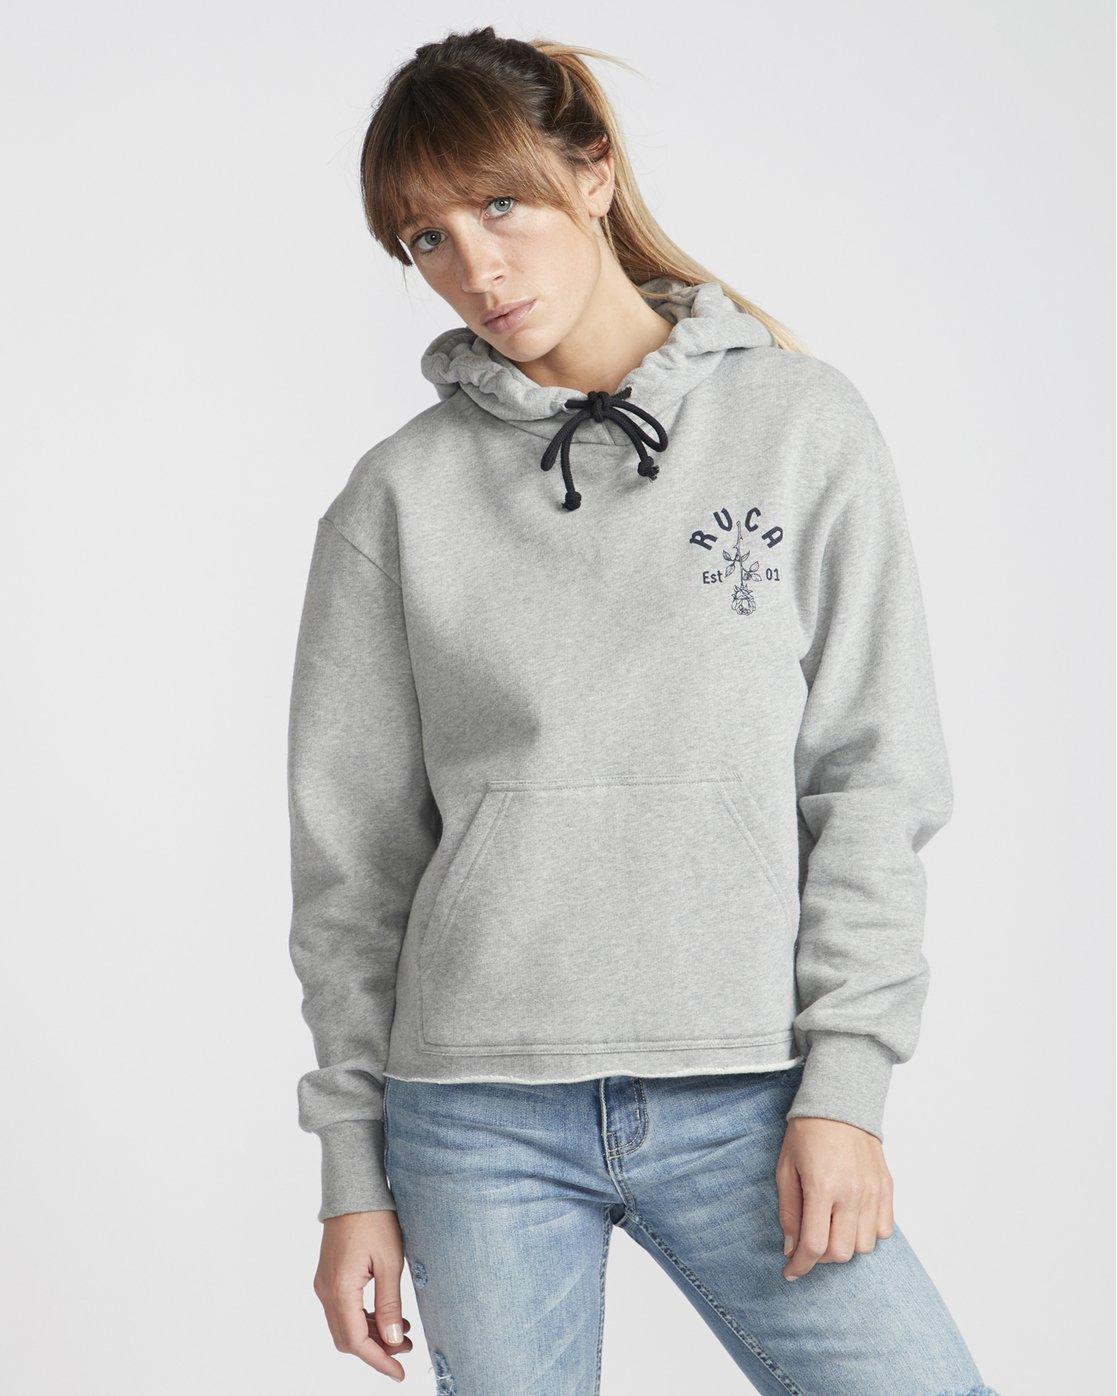 RVCA Fleece Women's Hoodies & Sweatshirts